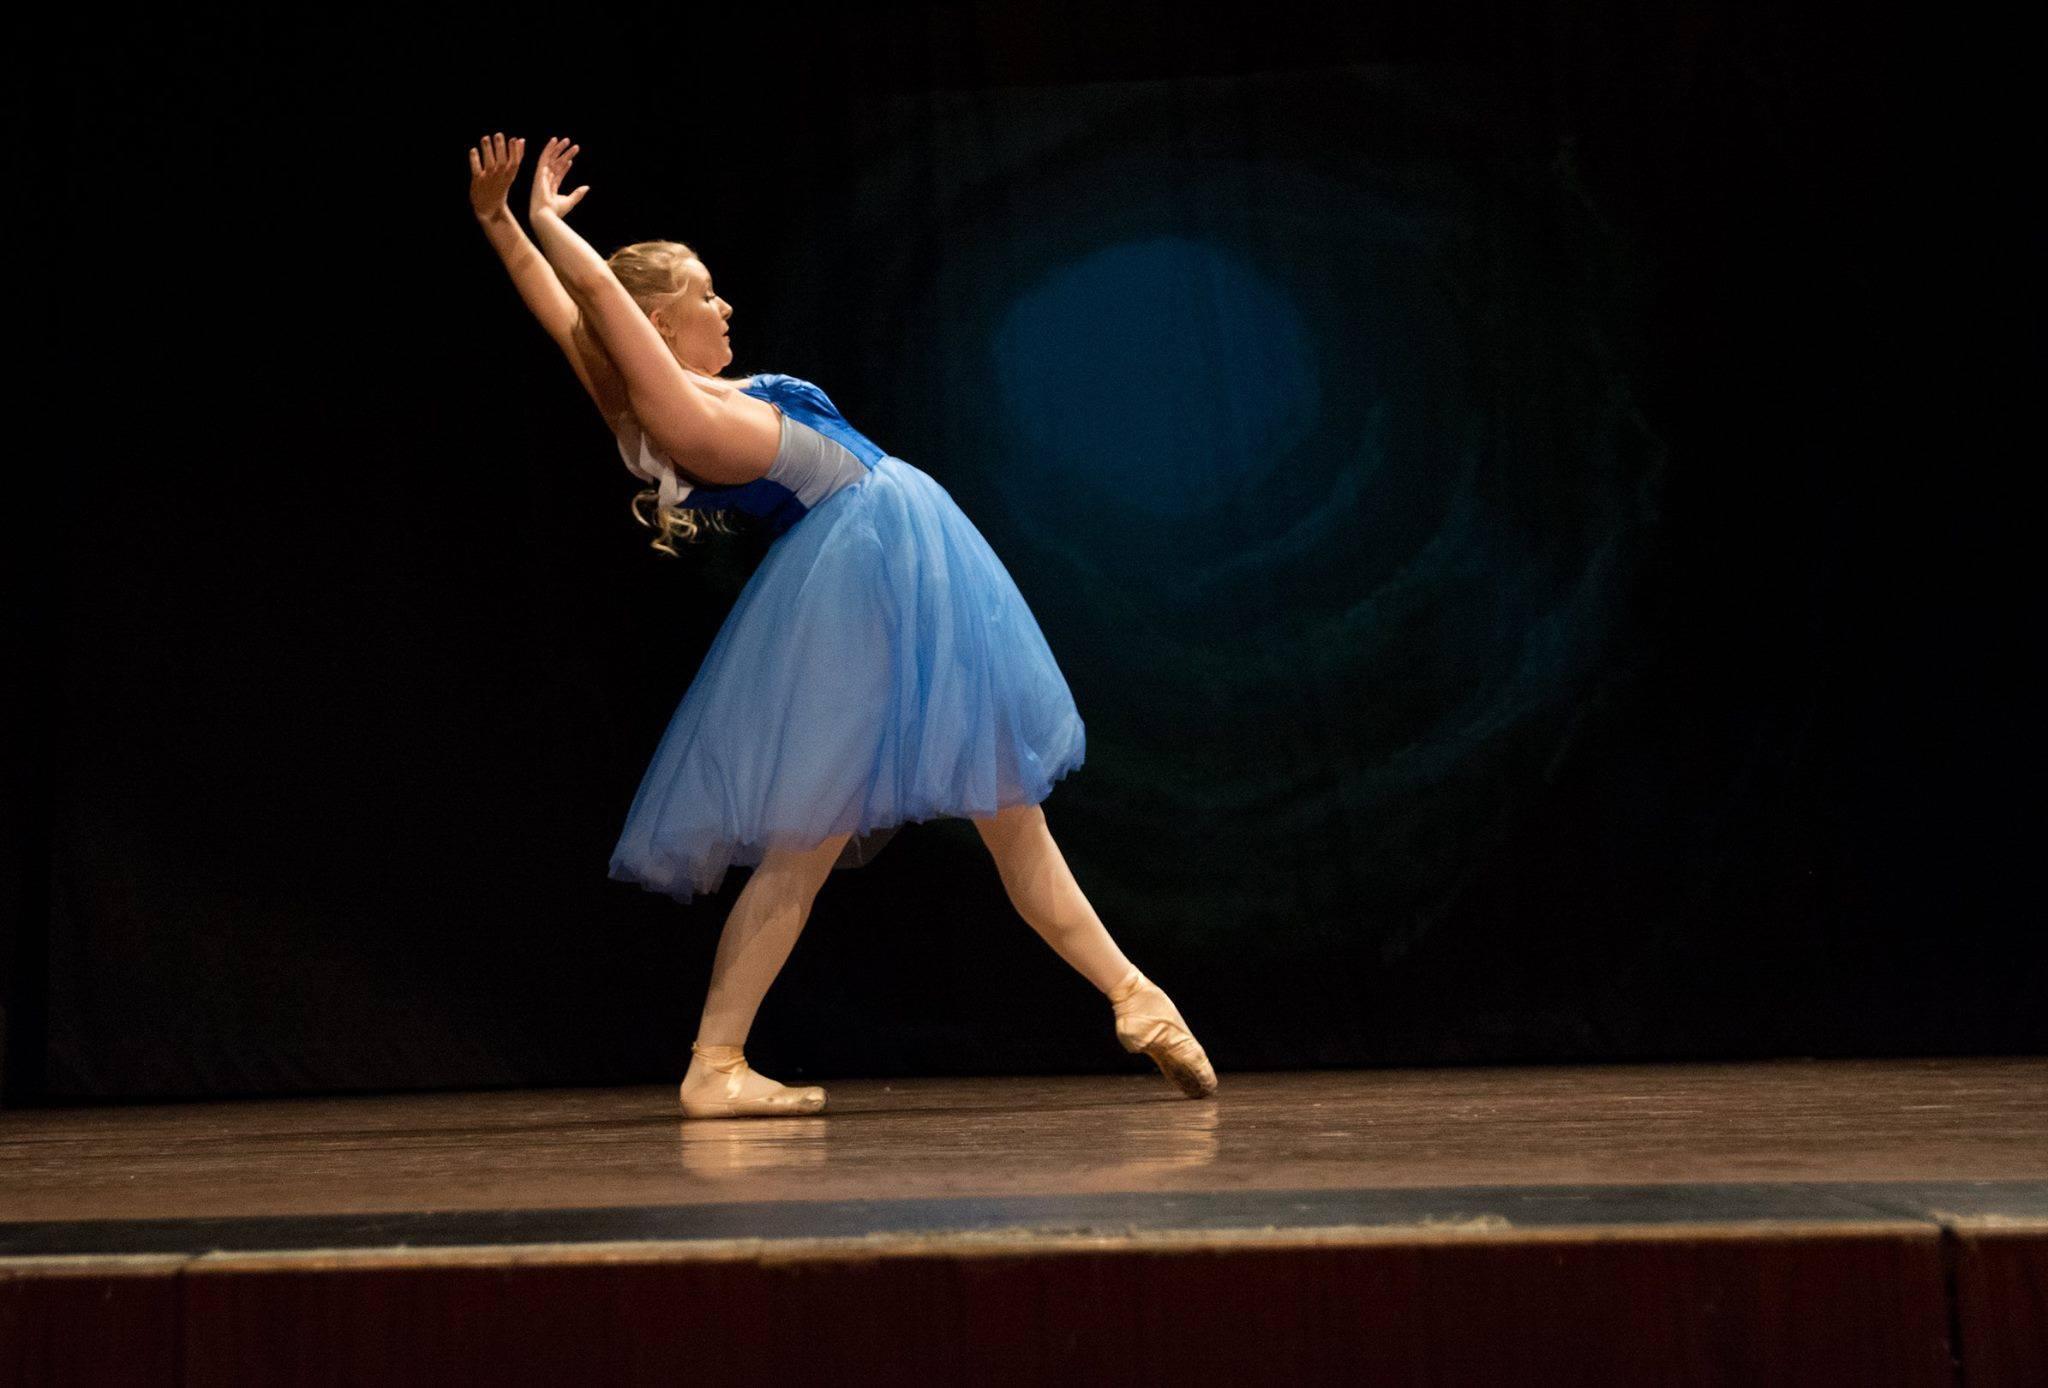 grace-dance-studio-kaiserslautern-einsiedlerhof-gallery-spring-showcase-alice-in-wonderland-4